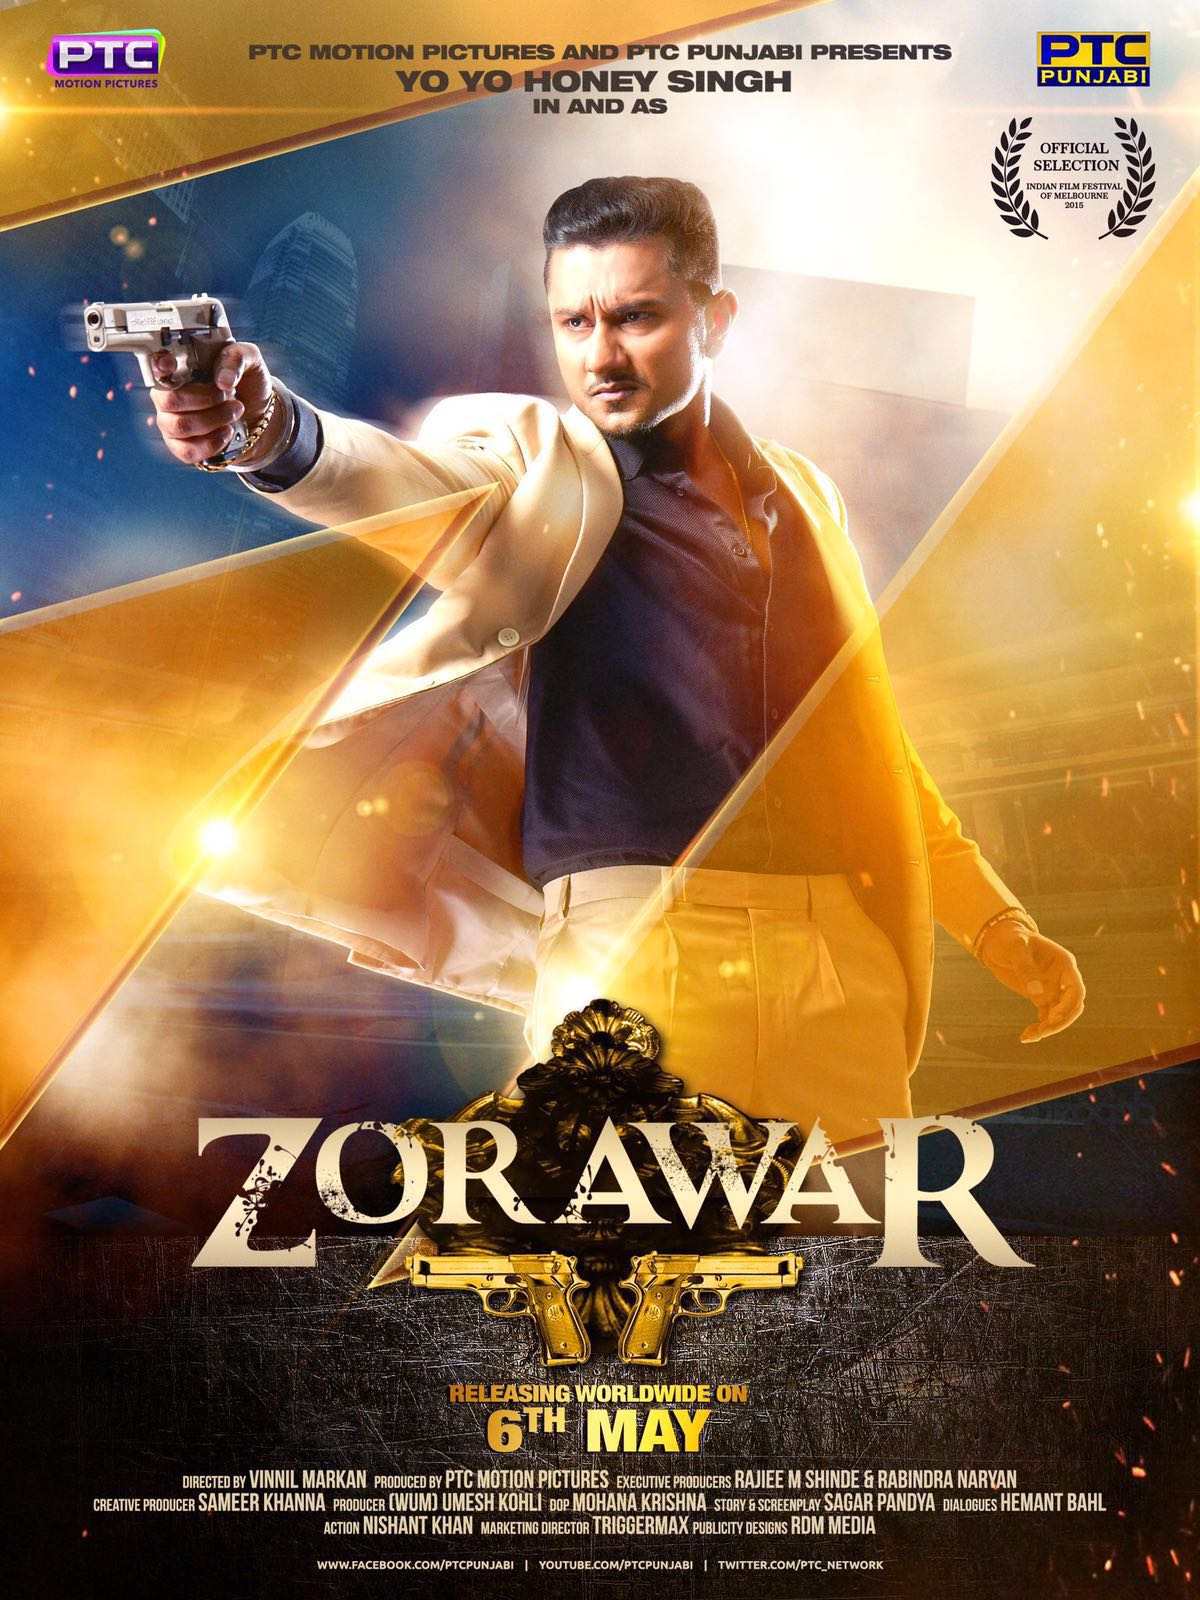 Zorawar (2016) Panjabi 720p HEVC HDRip x265  680MB